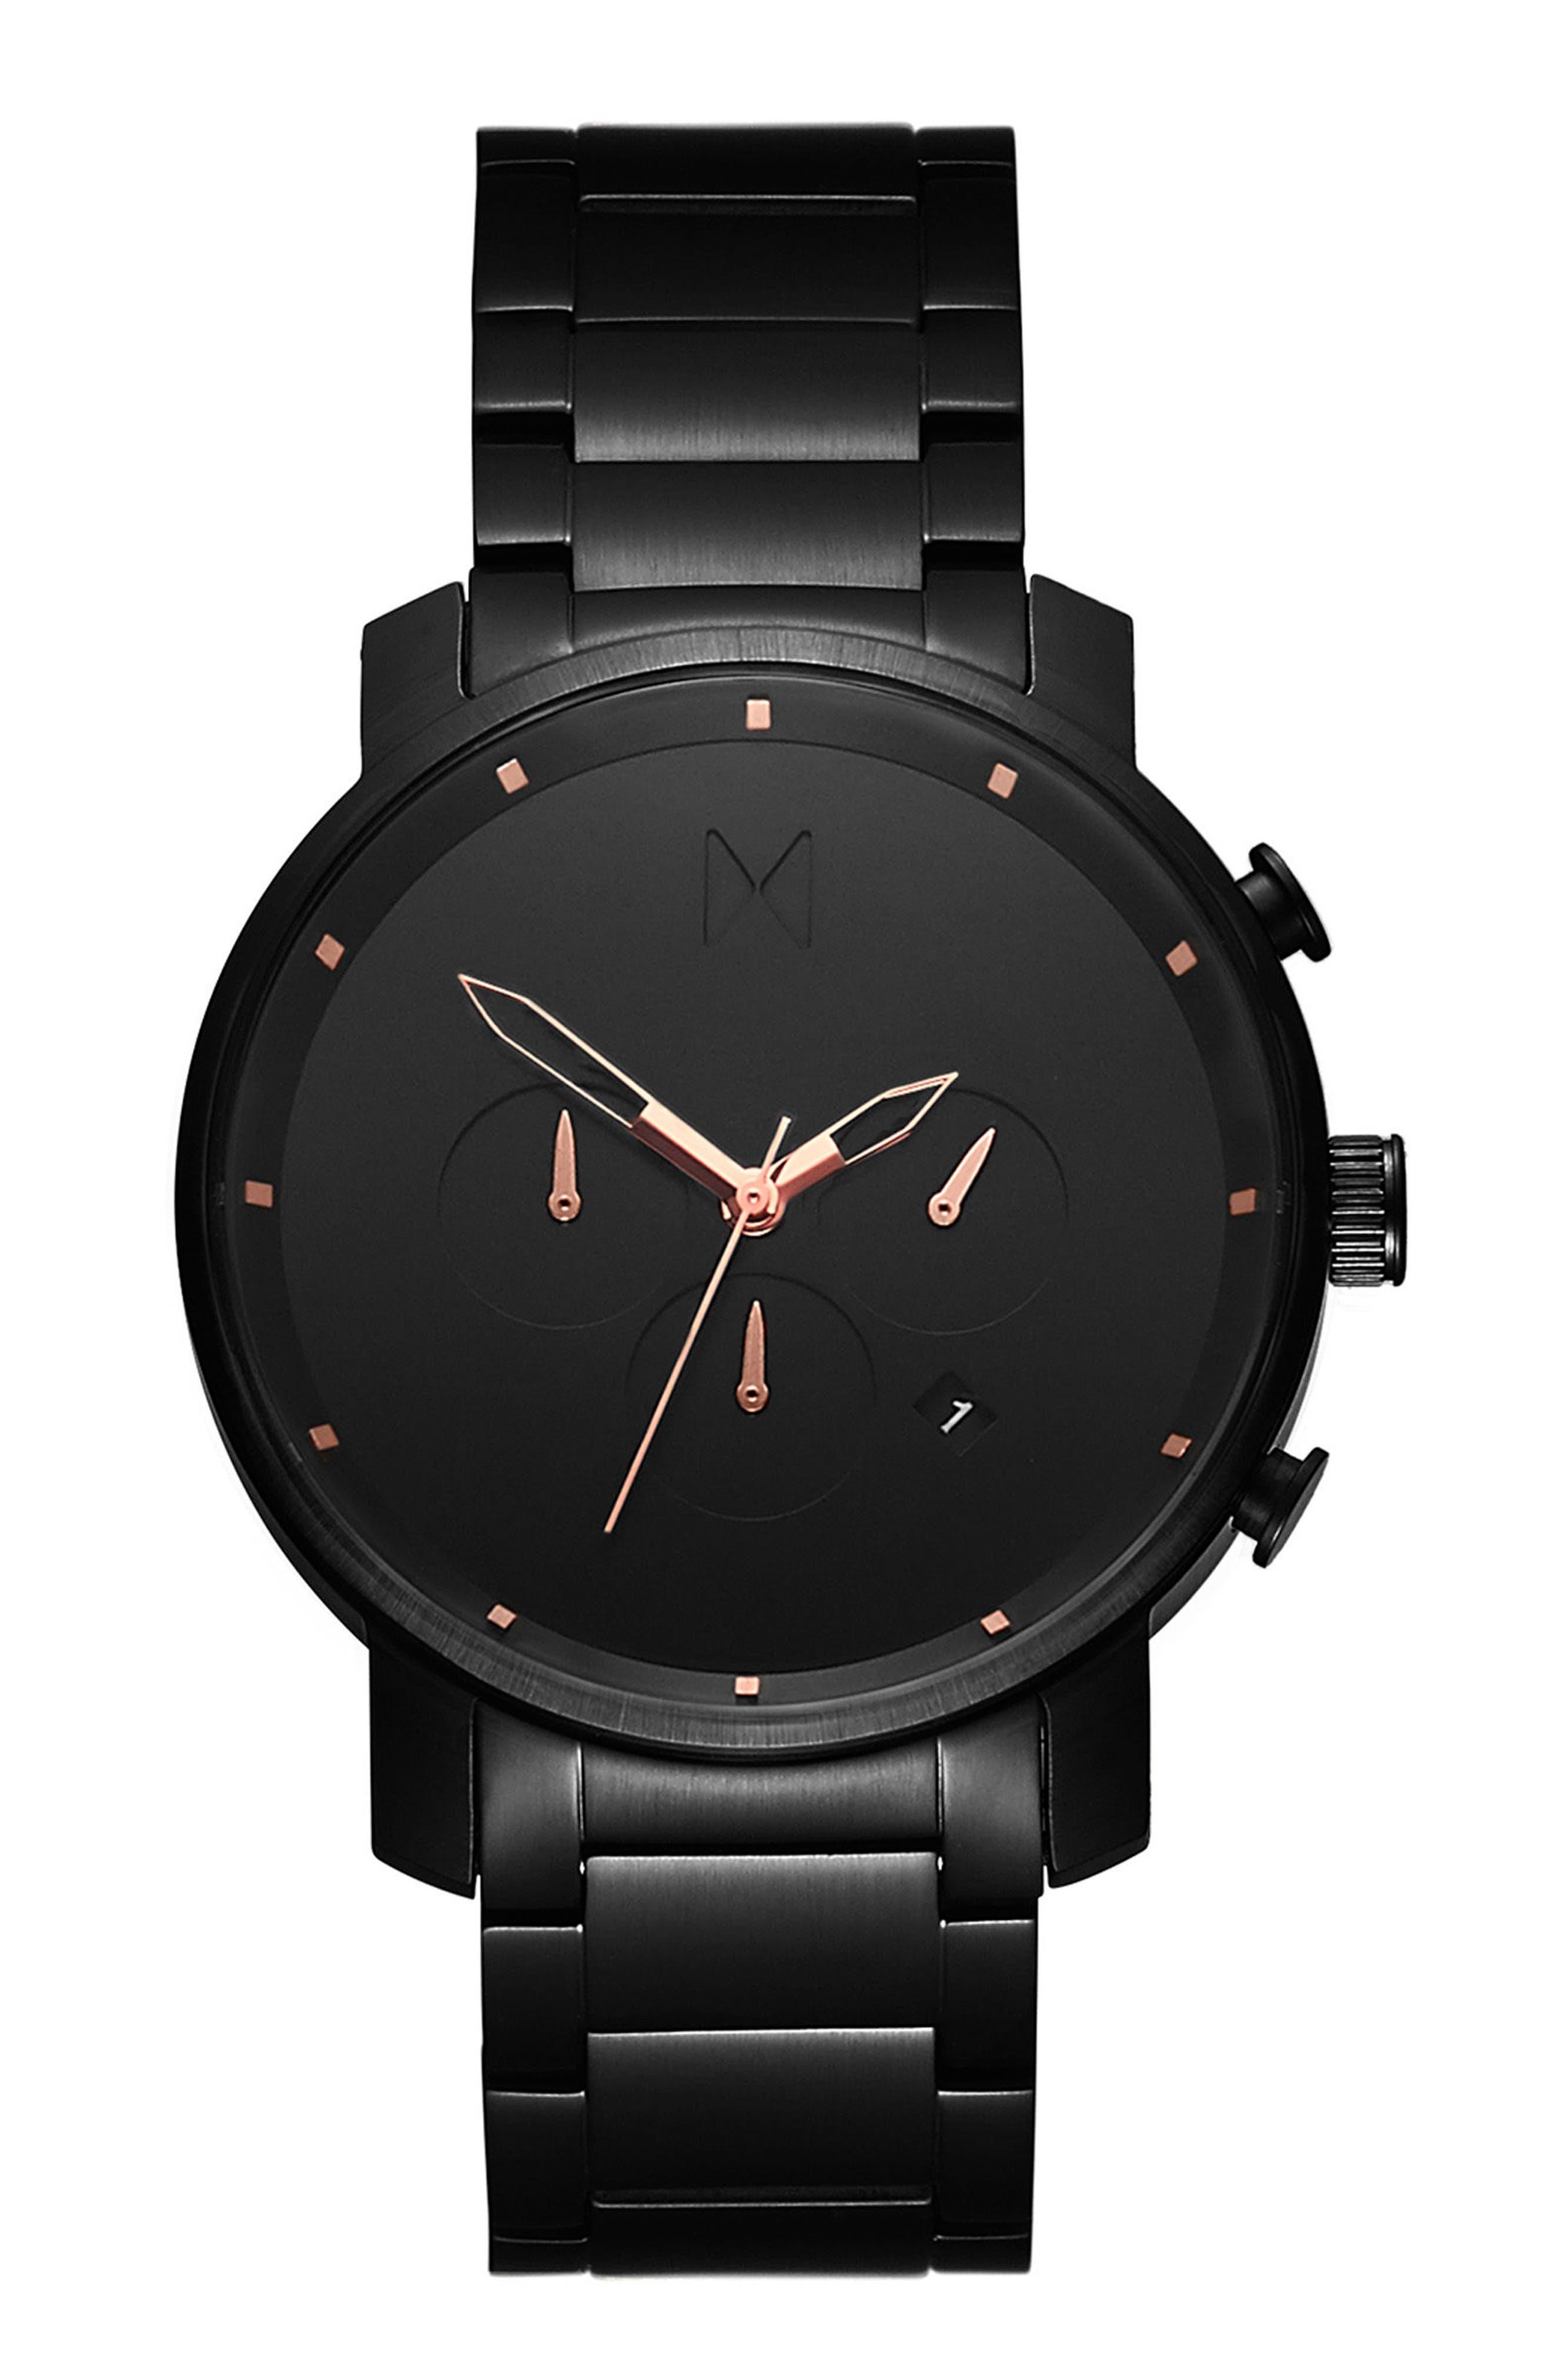 Main Image - MVMT The Chrono Chronograph Bracelet Watch, 45mm